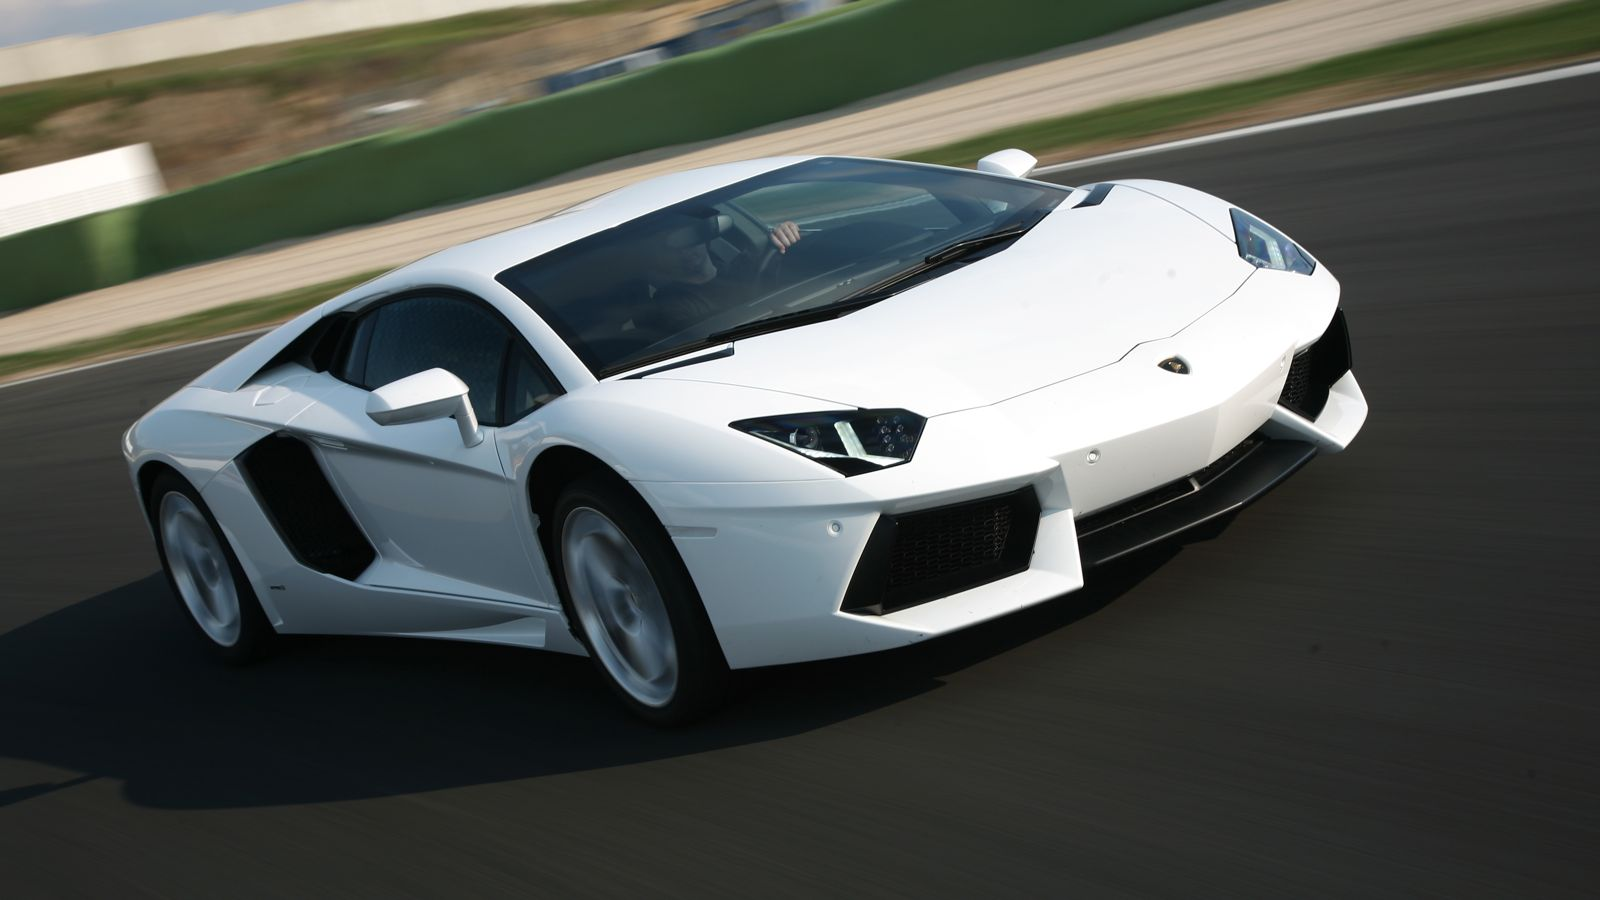 Lamborghini Aventador Free Wallpaper For Iphone